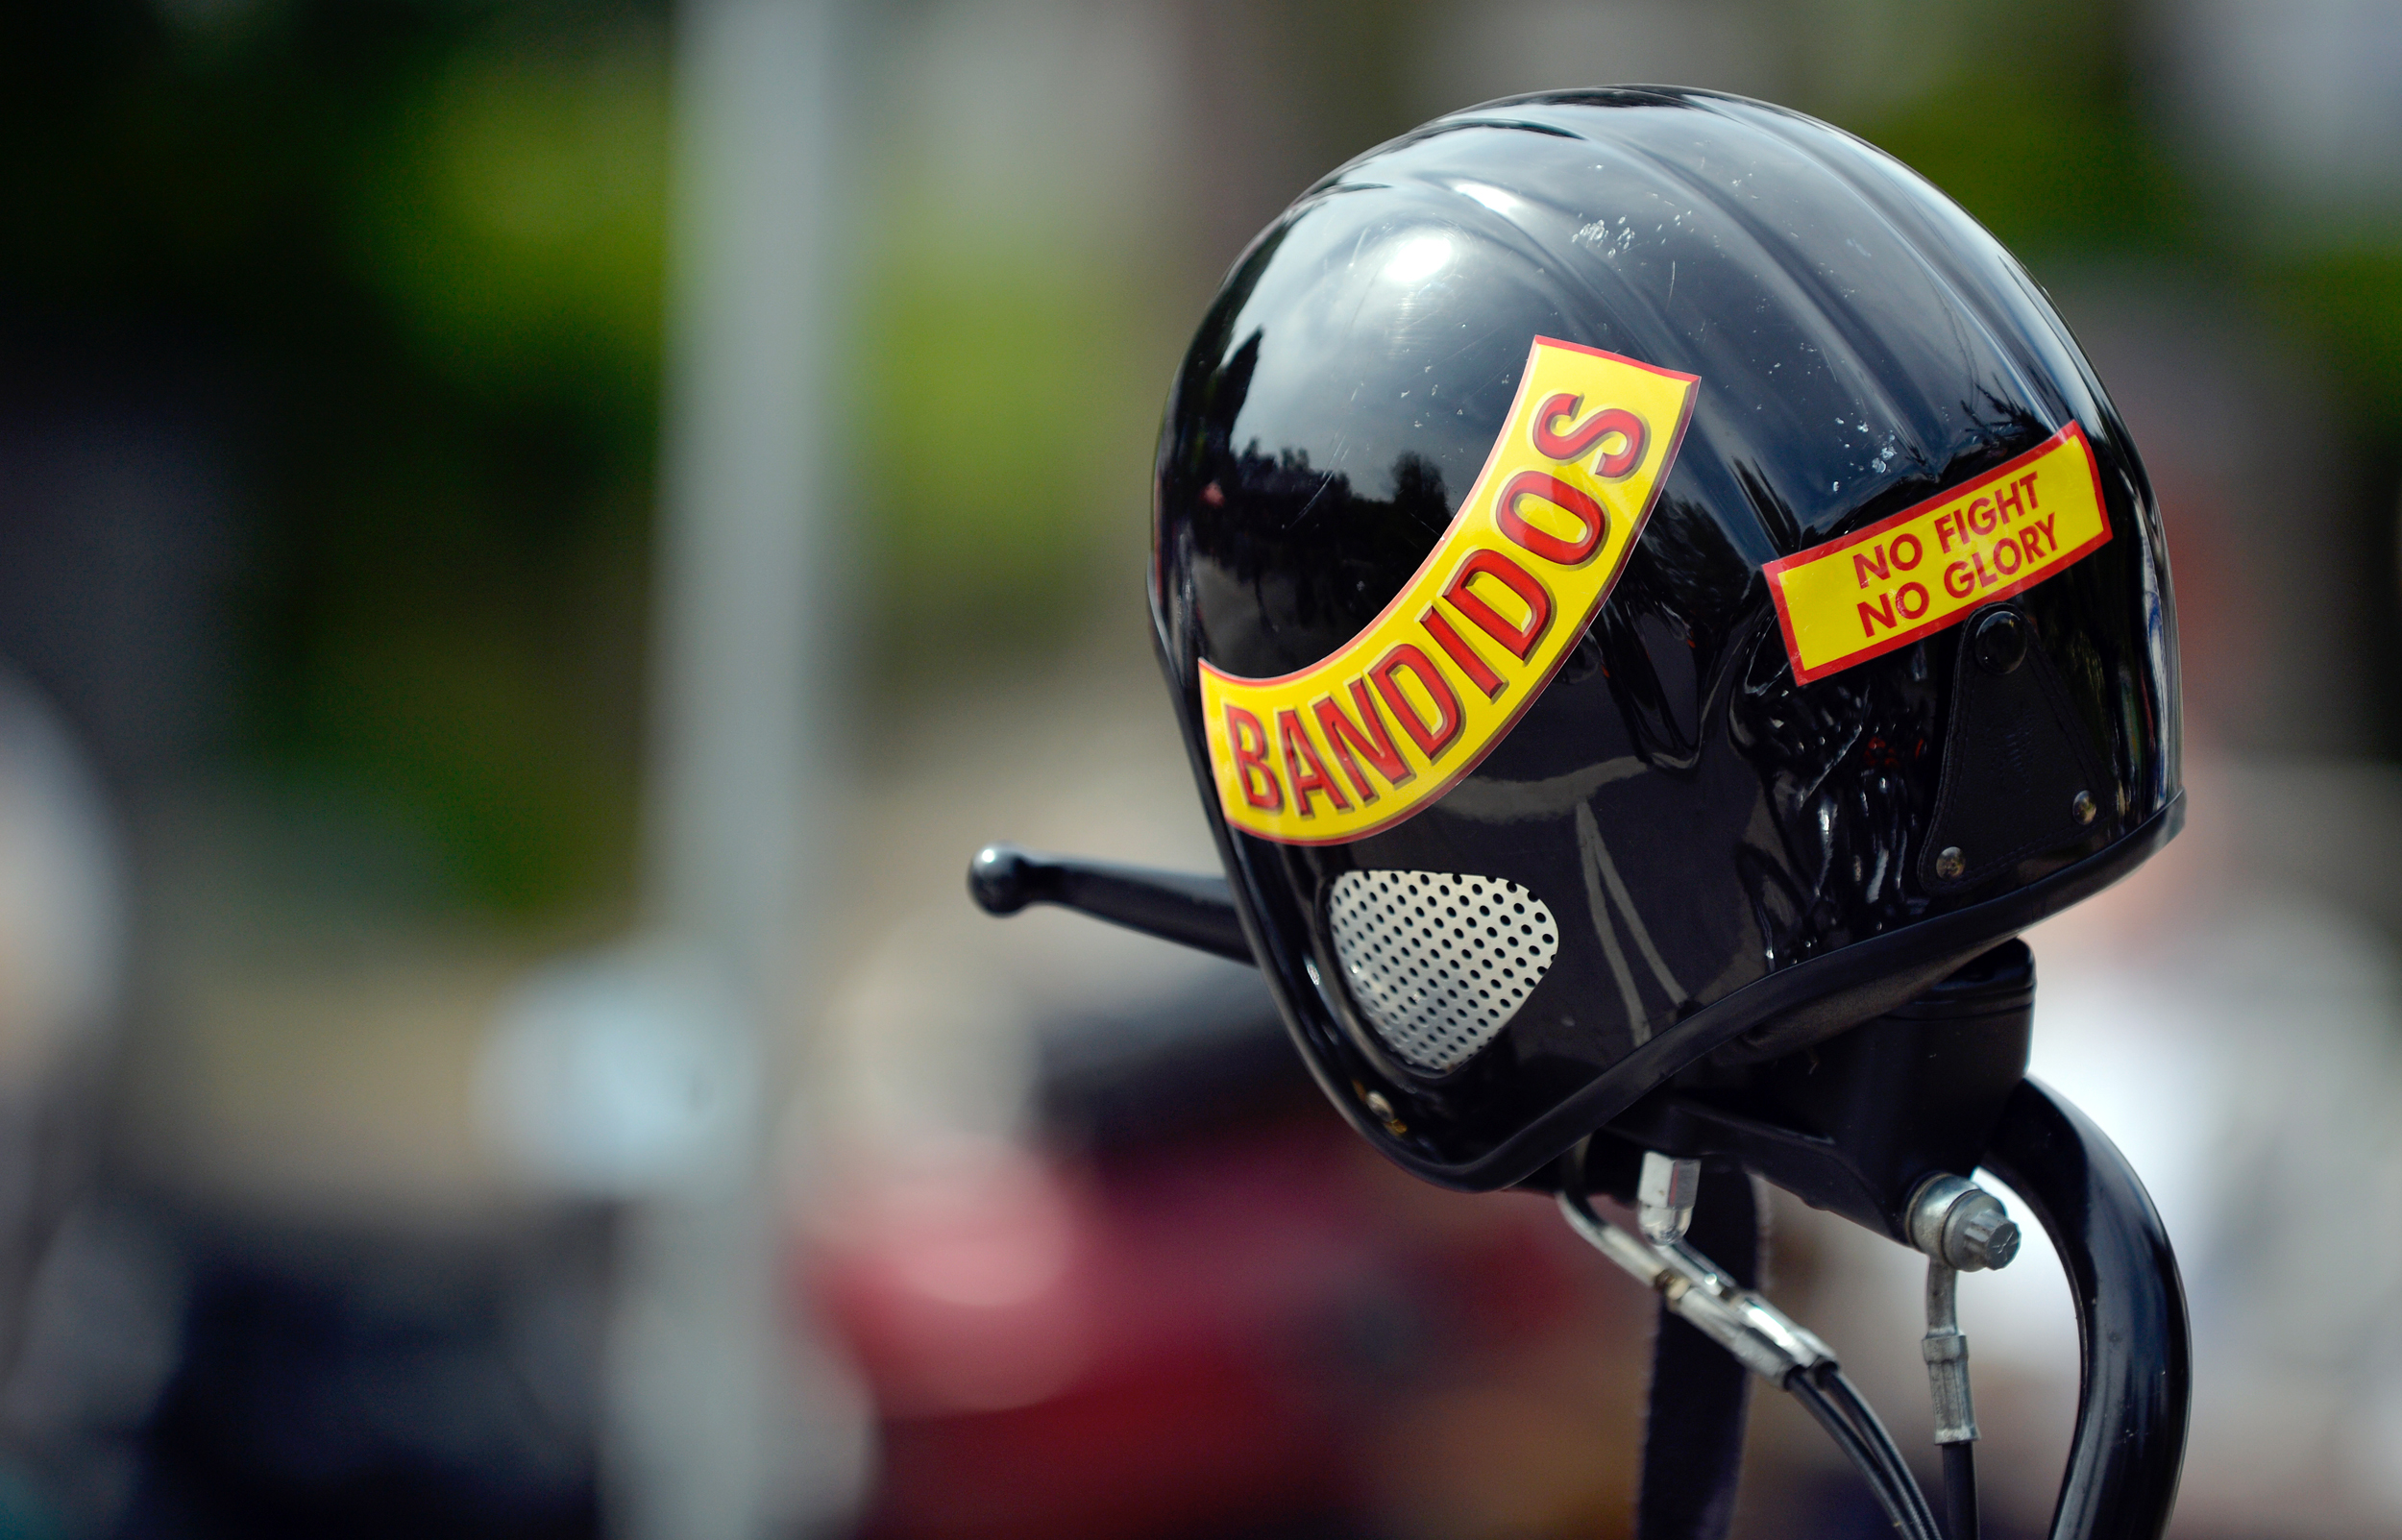 Waco Biker Brawl Bandidos Are Baddest Of The Bad